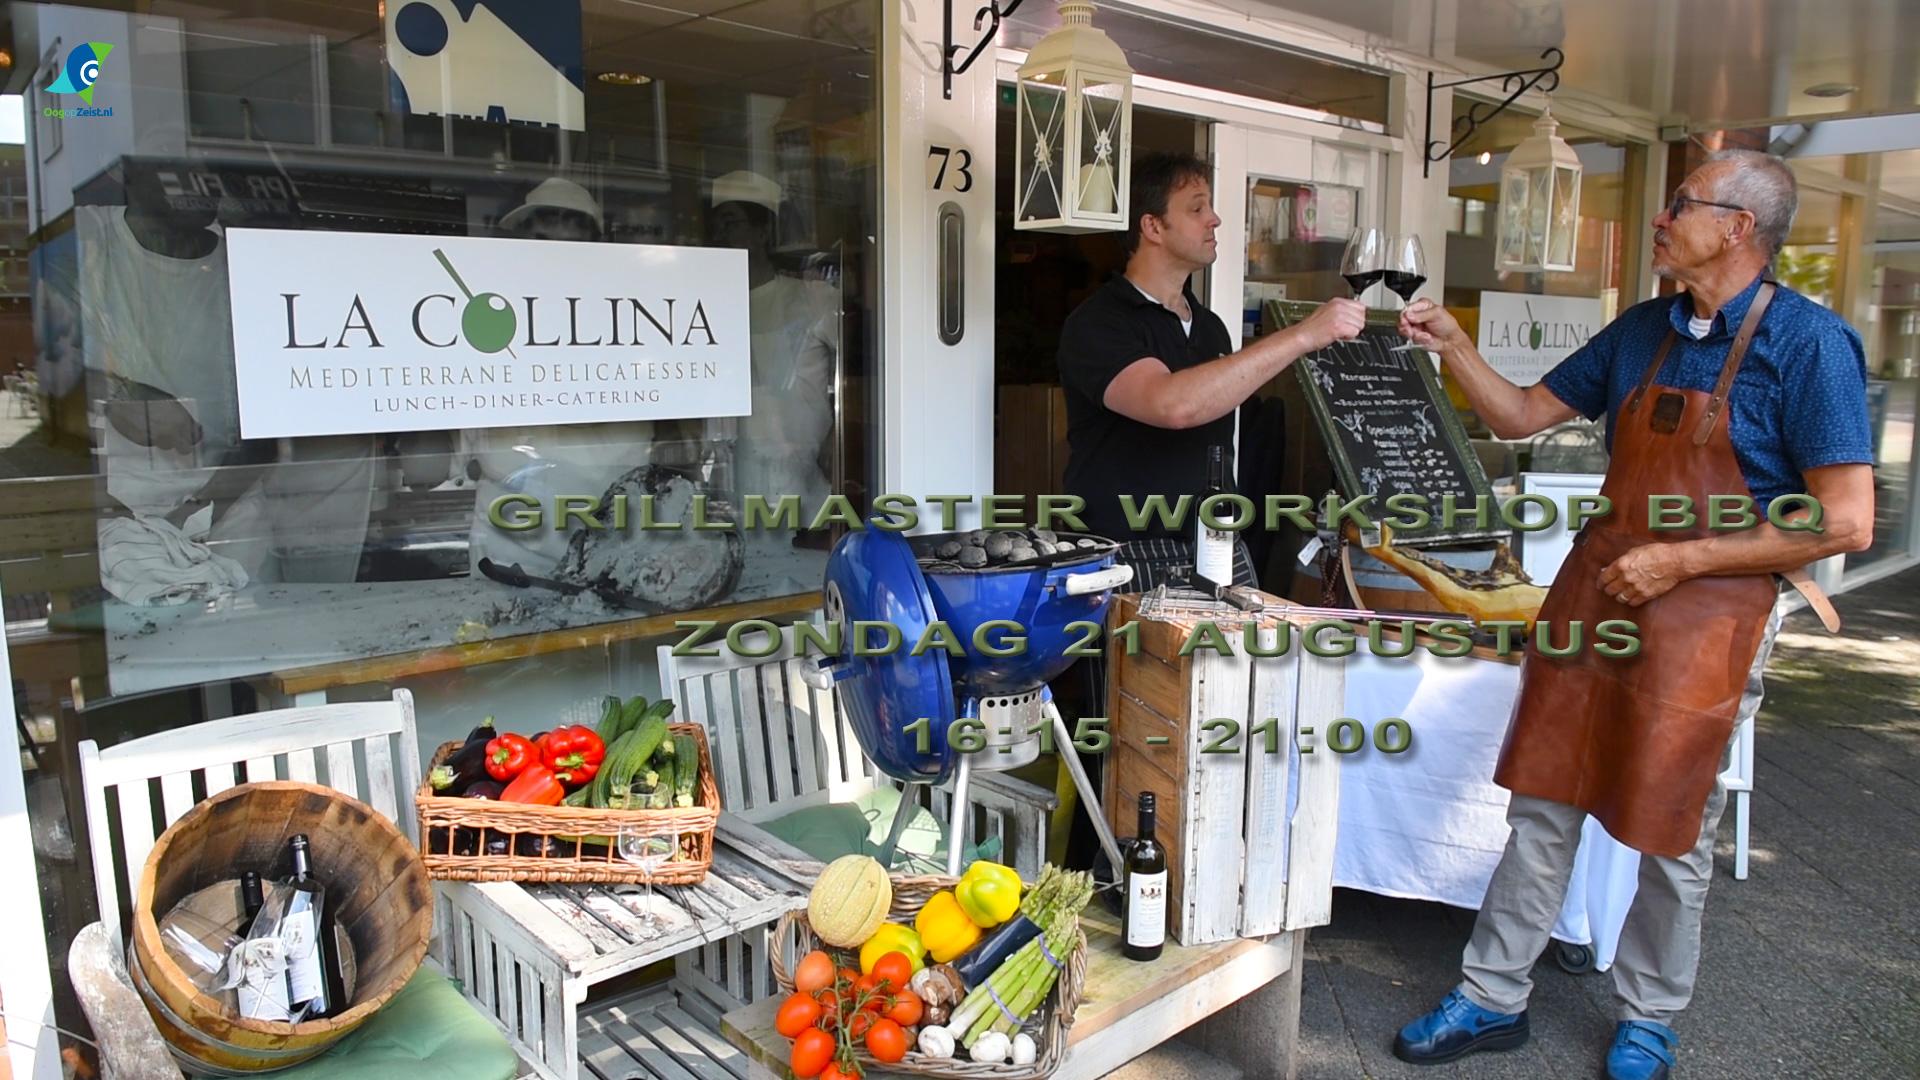 LaCollina&GRILLMASTER WORKSHOP